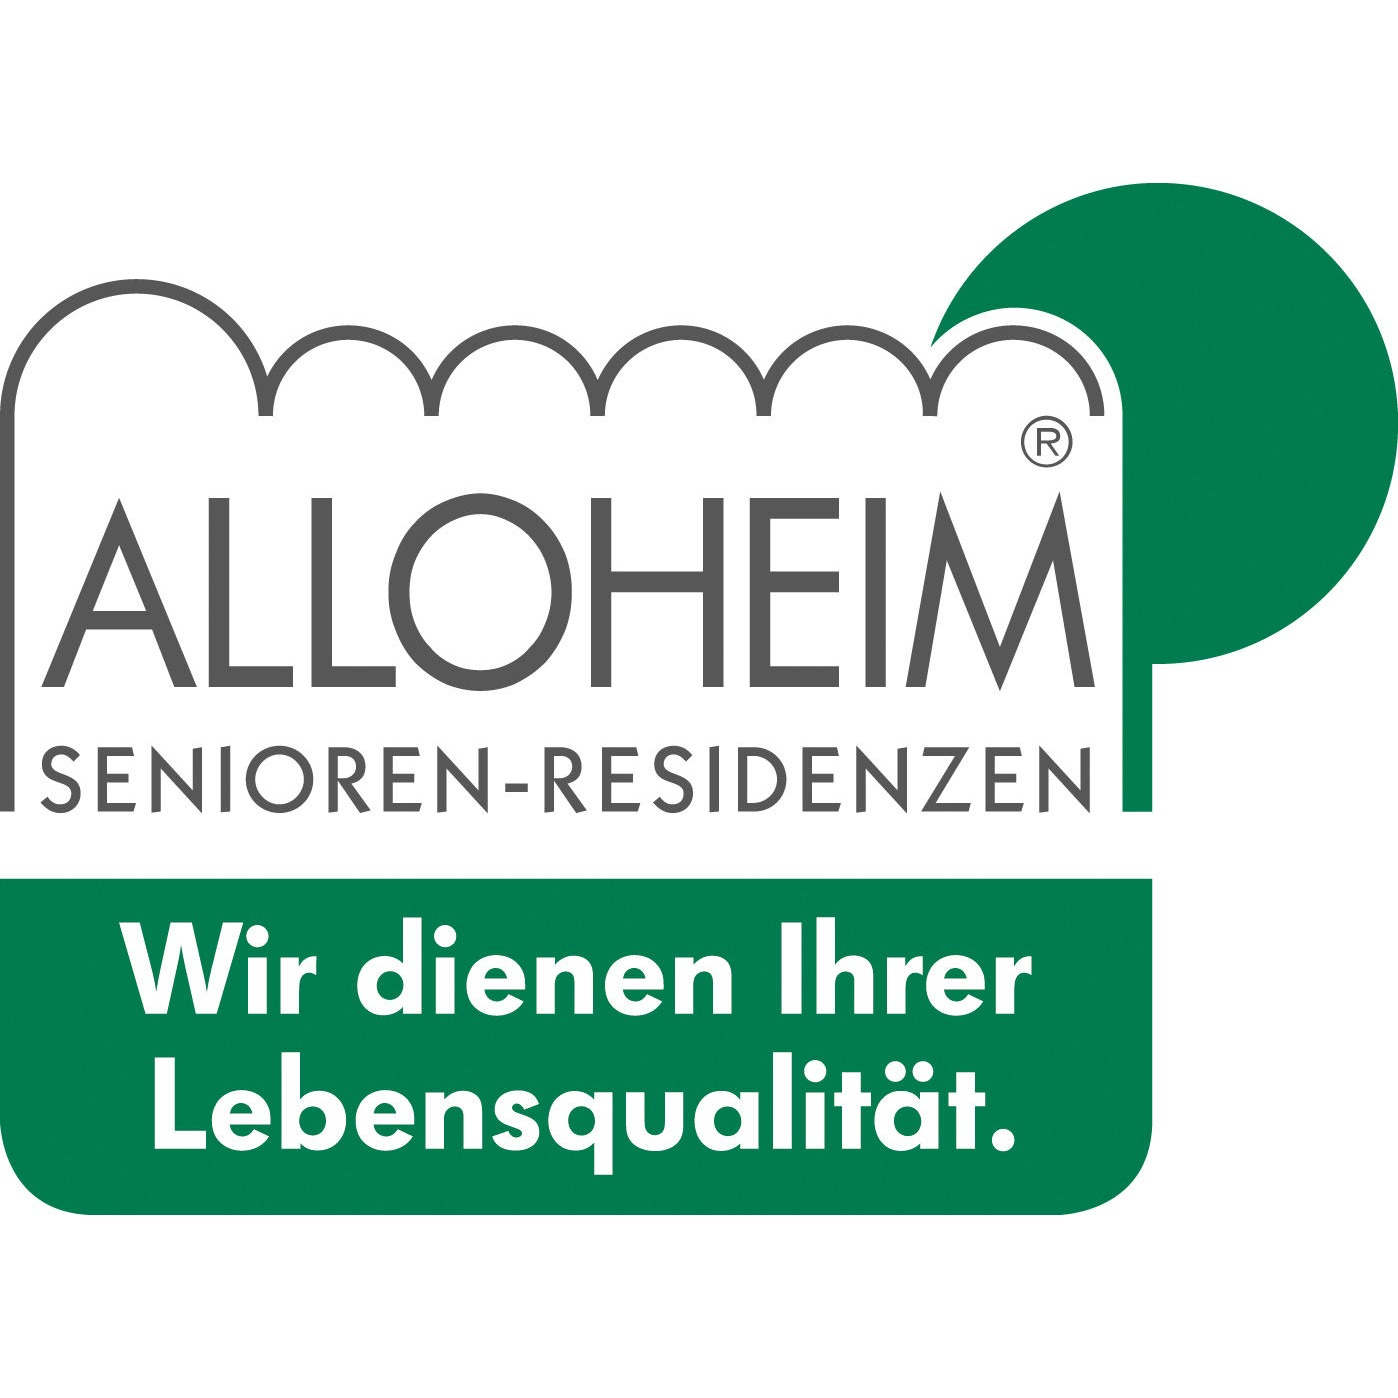 Logo Alloheim Senioren-Residenz